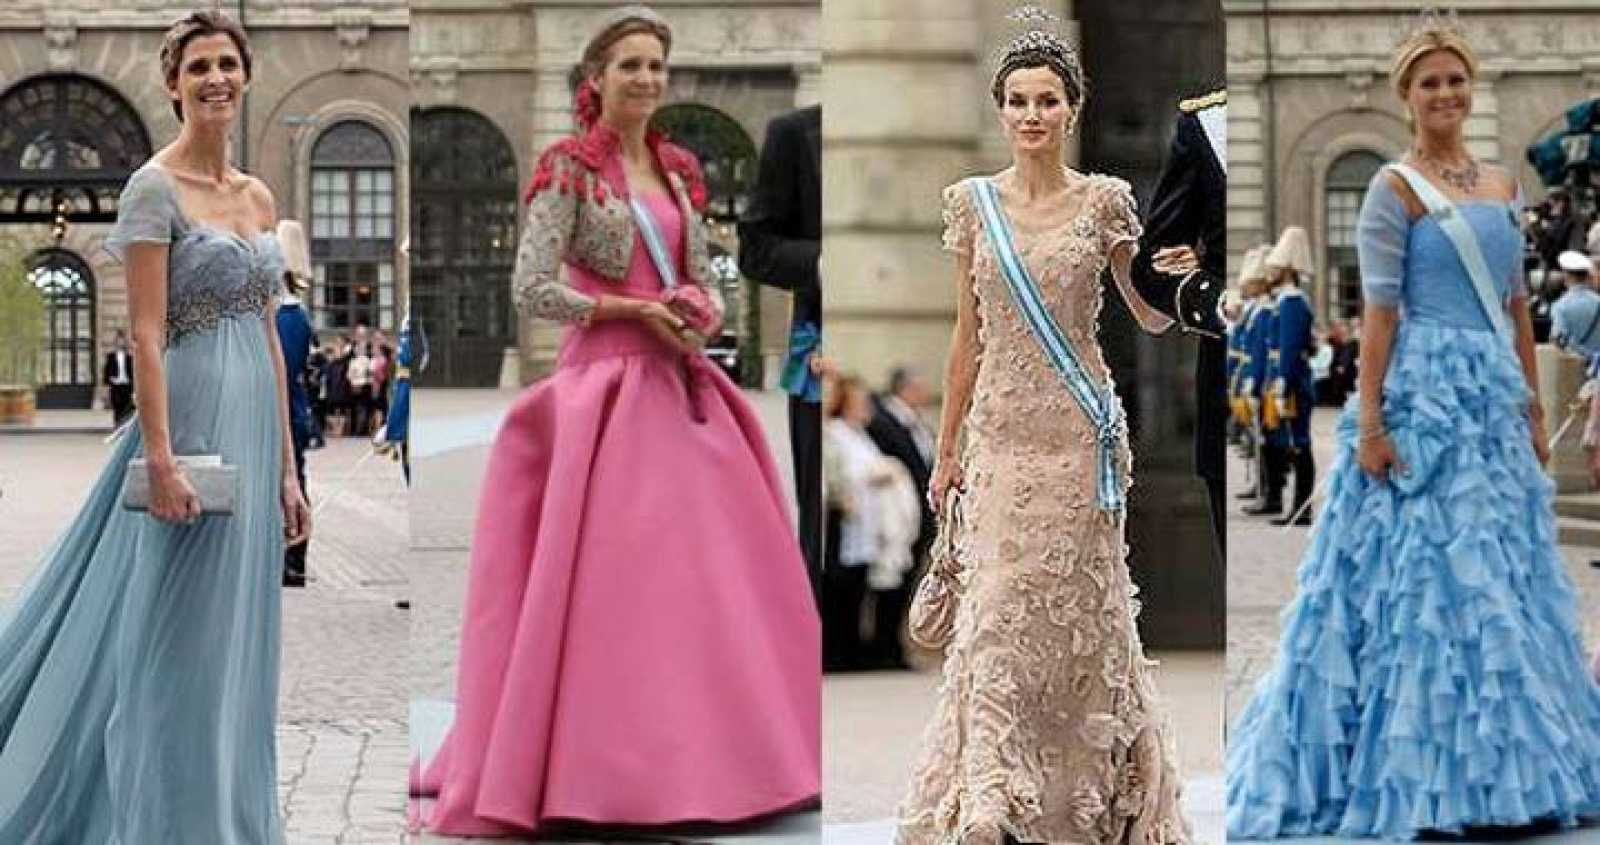 Vistoso Vestidos Invitado A La Boda Real Motivo - Ideas de Estilos ...